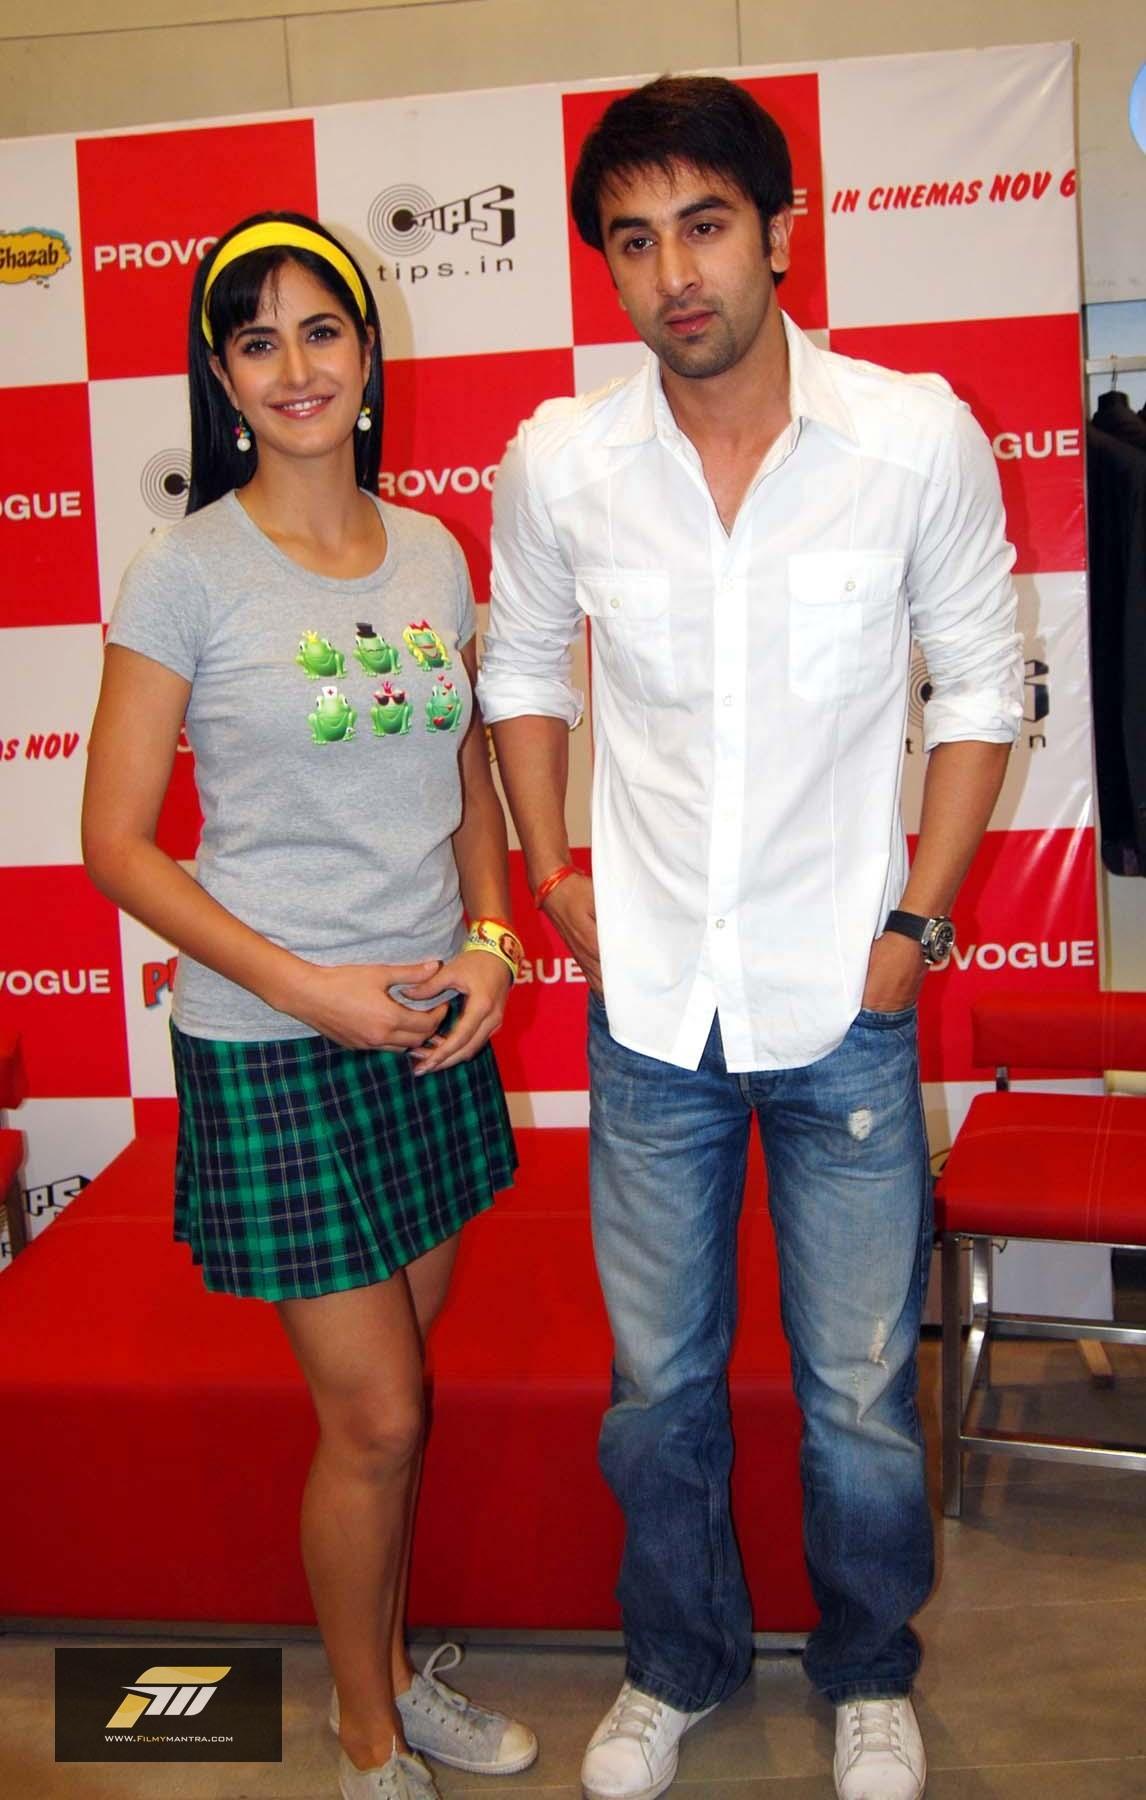 Free-Katrina-Kaif-with-Ranbir-Kapoor-Hd-Wallpapers